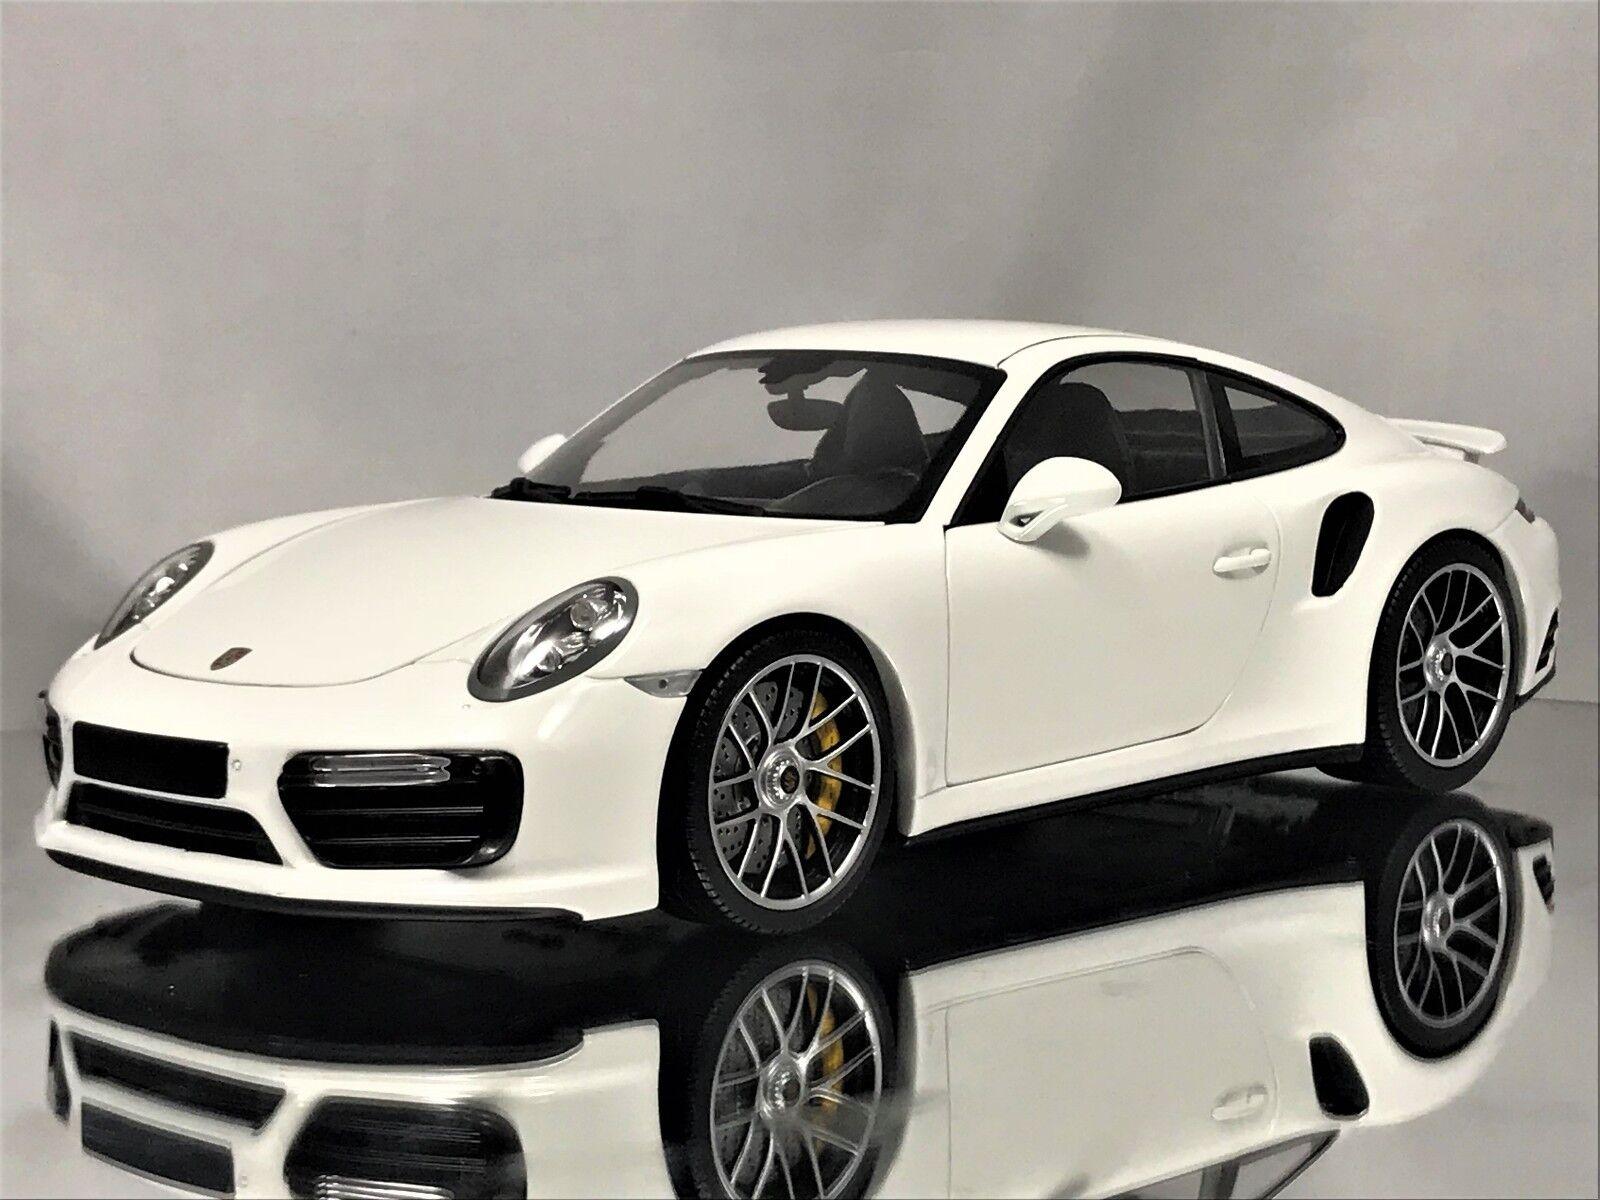 Minichamps Porsche 911 (991 II) MkII Turbo S 2016 Blanc Voiture Modèle 1 18